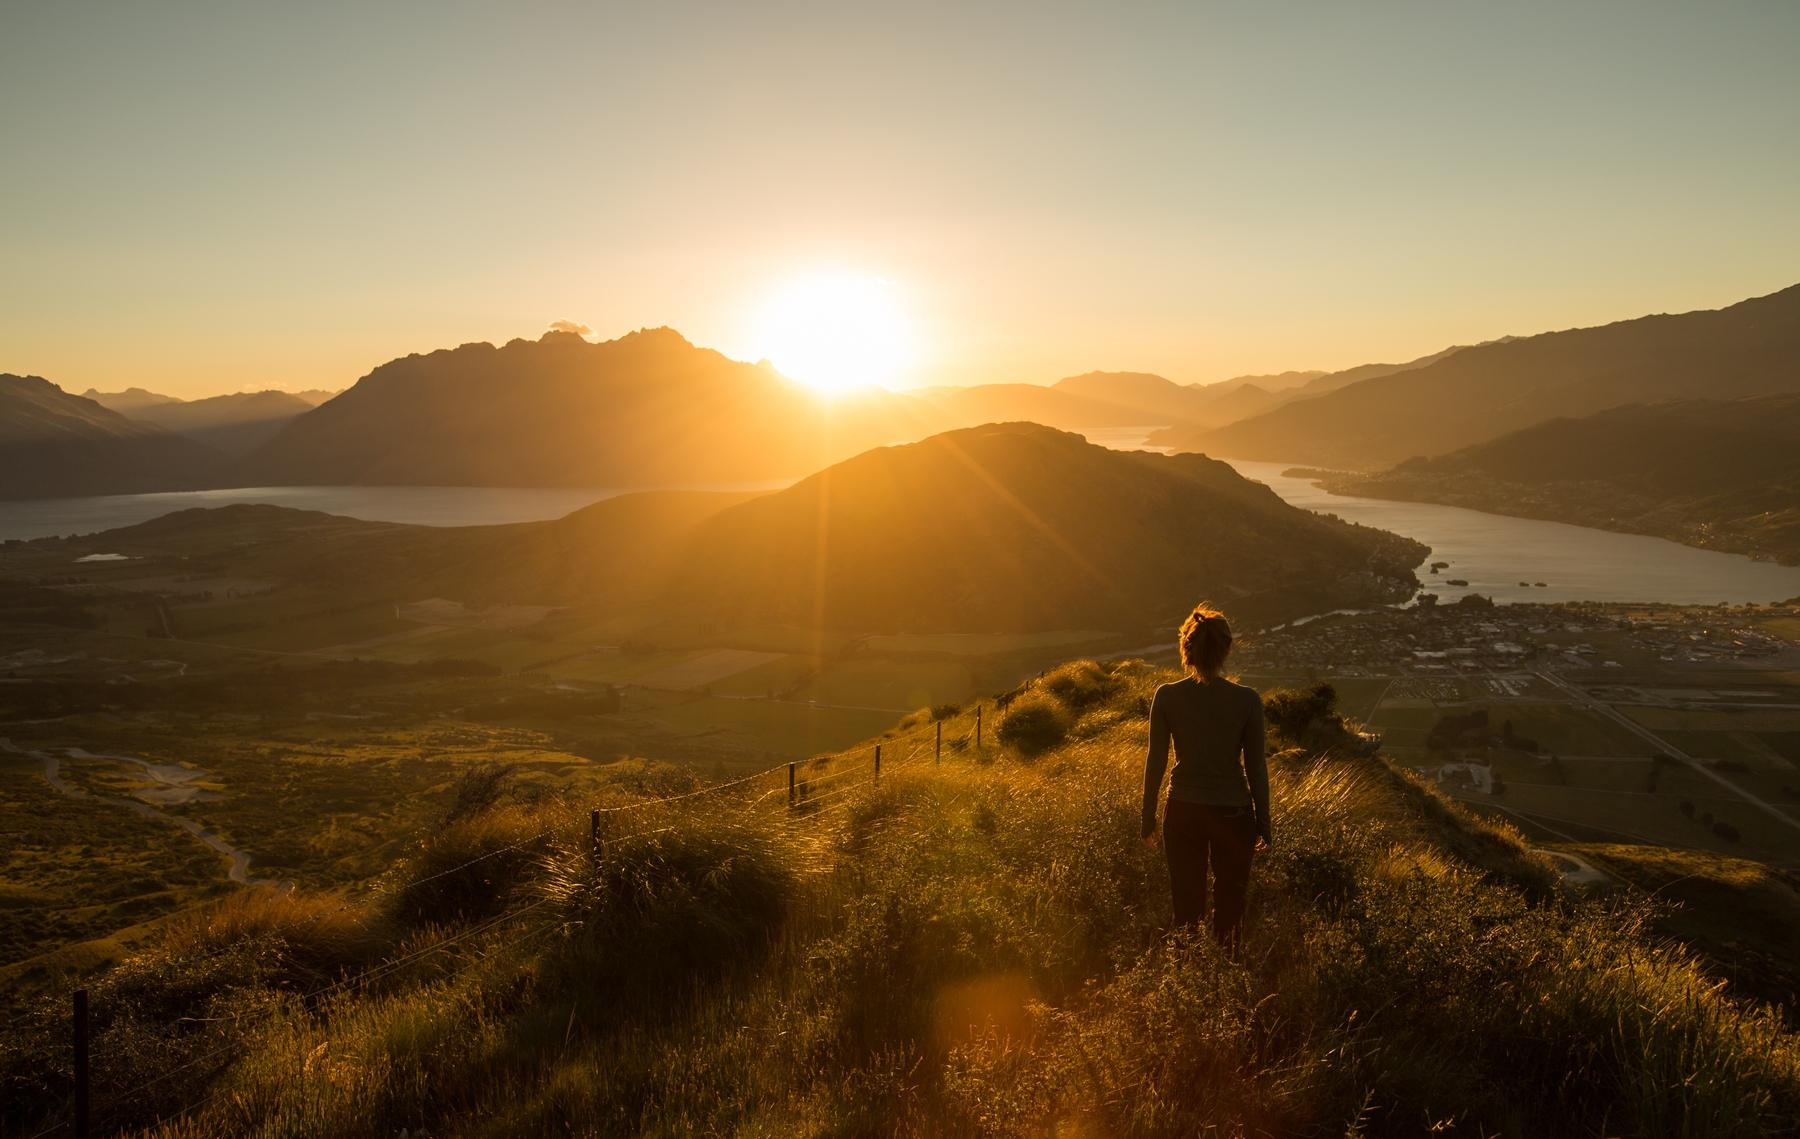 Hiking in New Zealand; New Zealand is open now to Australian trekkers